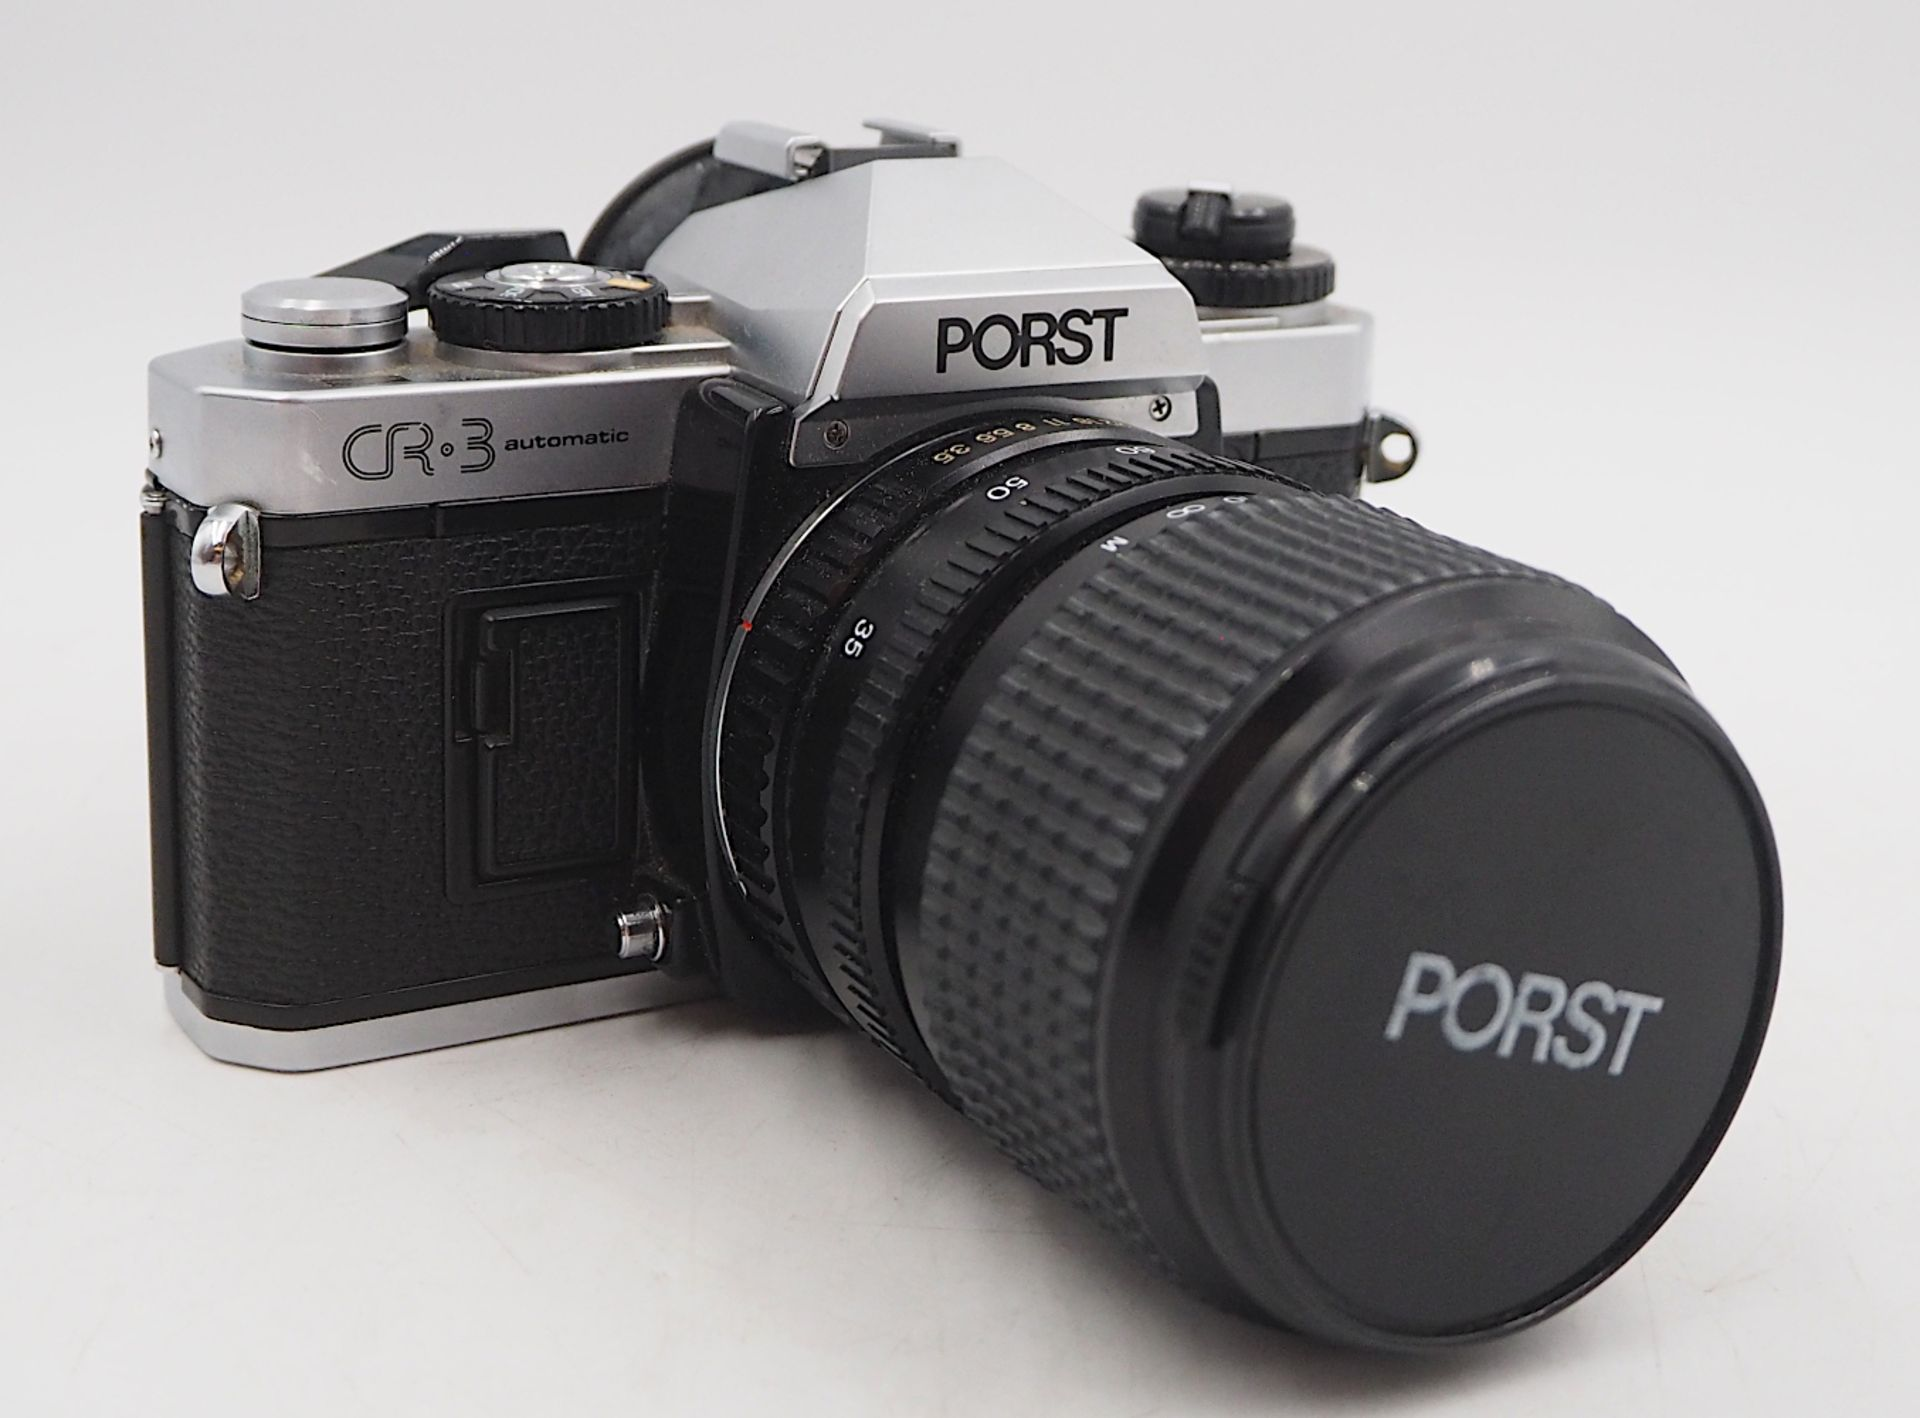 "1 Fotoapparat PORST ""CR-3 Automatic"" mit Objektiv PORST ""Unizoom 1:3,5-4,5/35-70mm Mac"